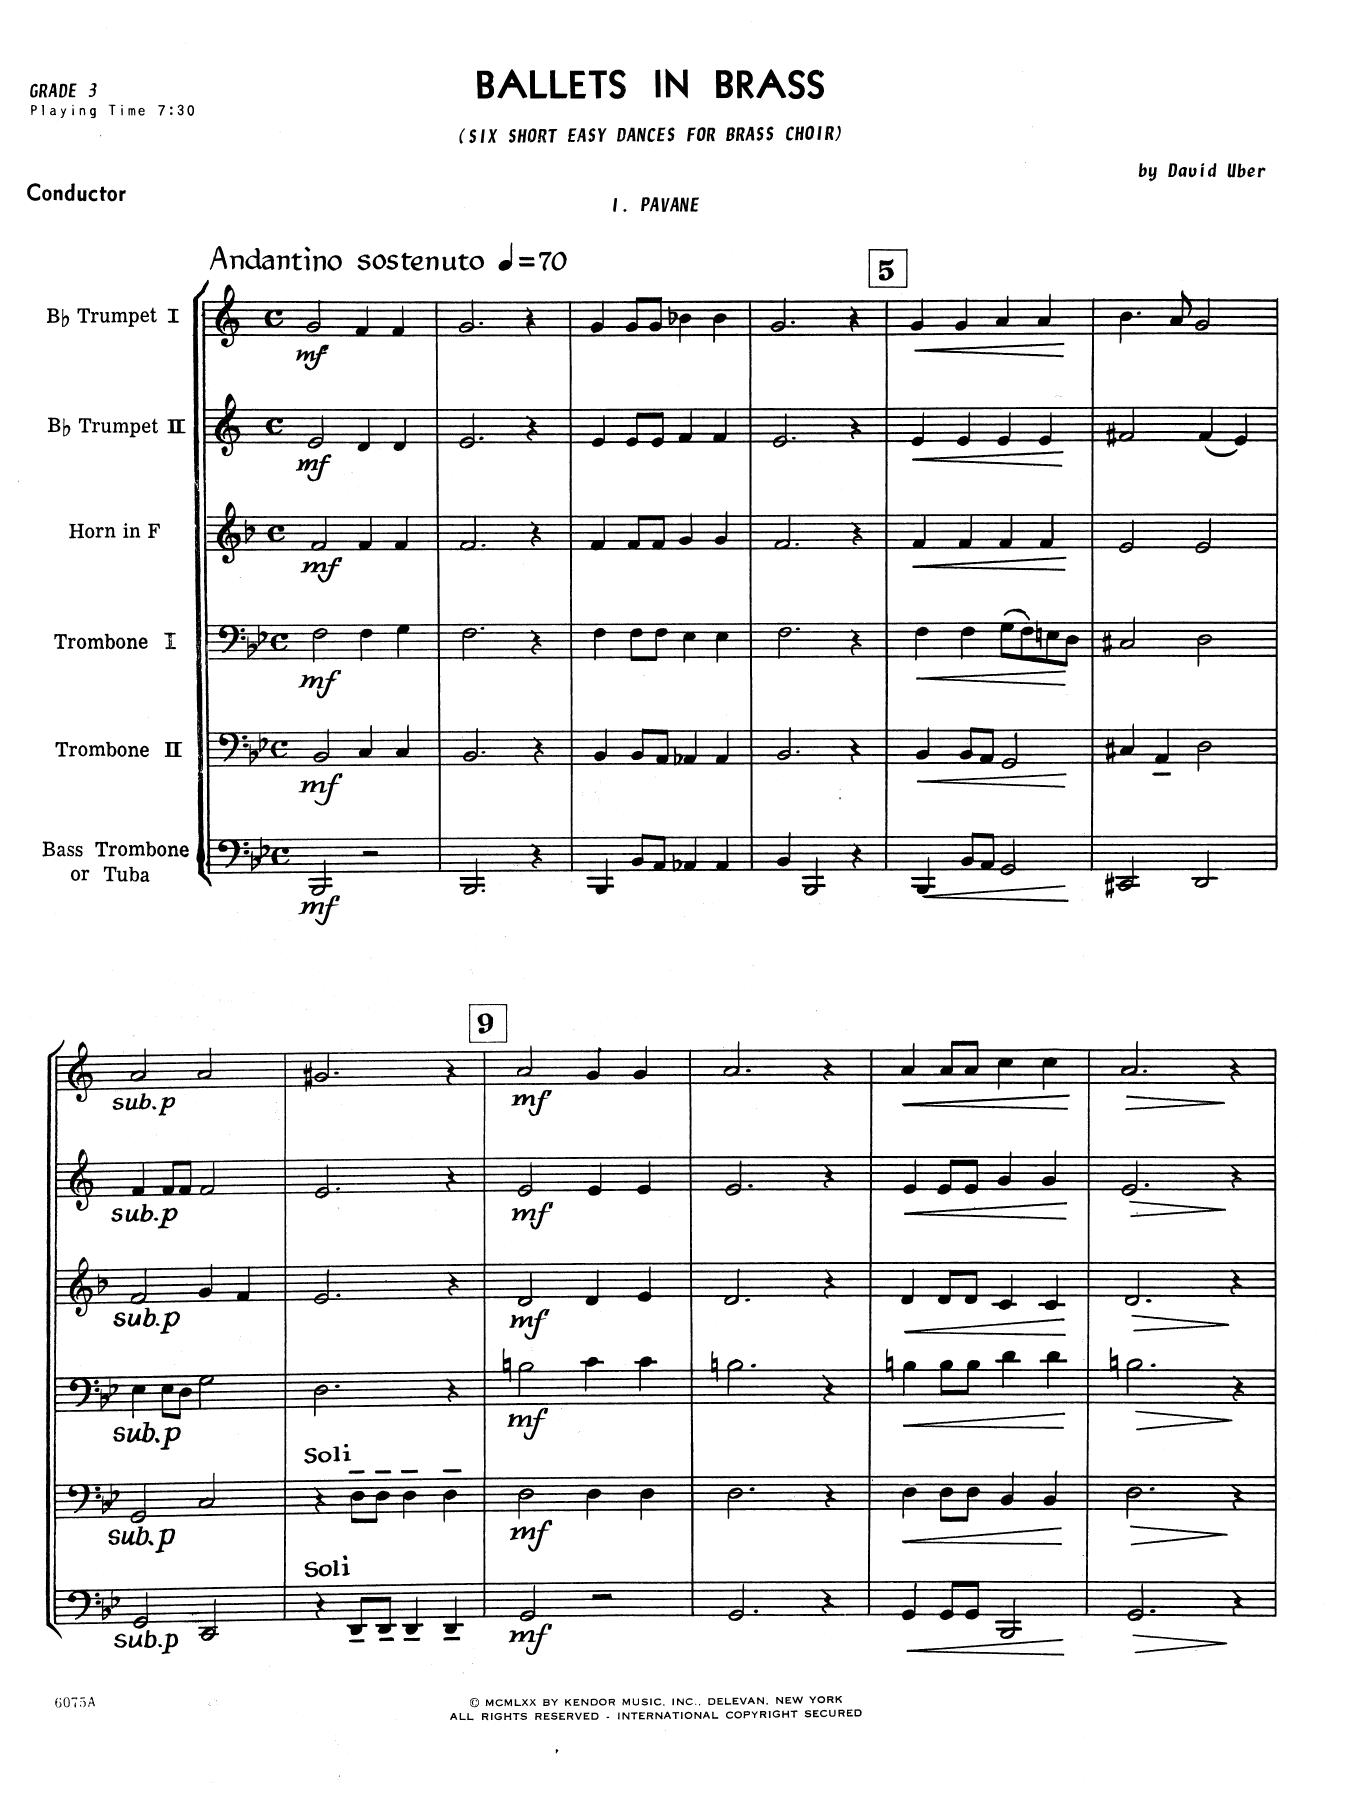 Ballets In Brass (Six Short Dances) (COMPLETE) sheet music for brass ensemble by David Uber